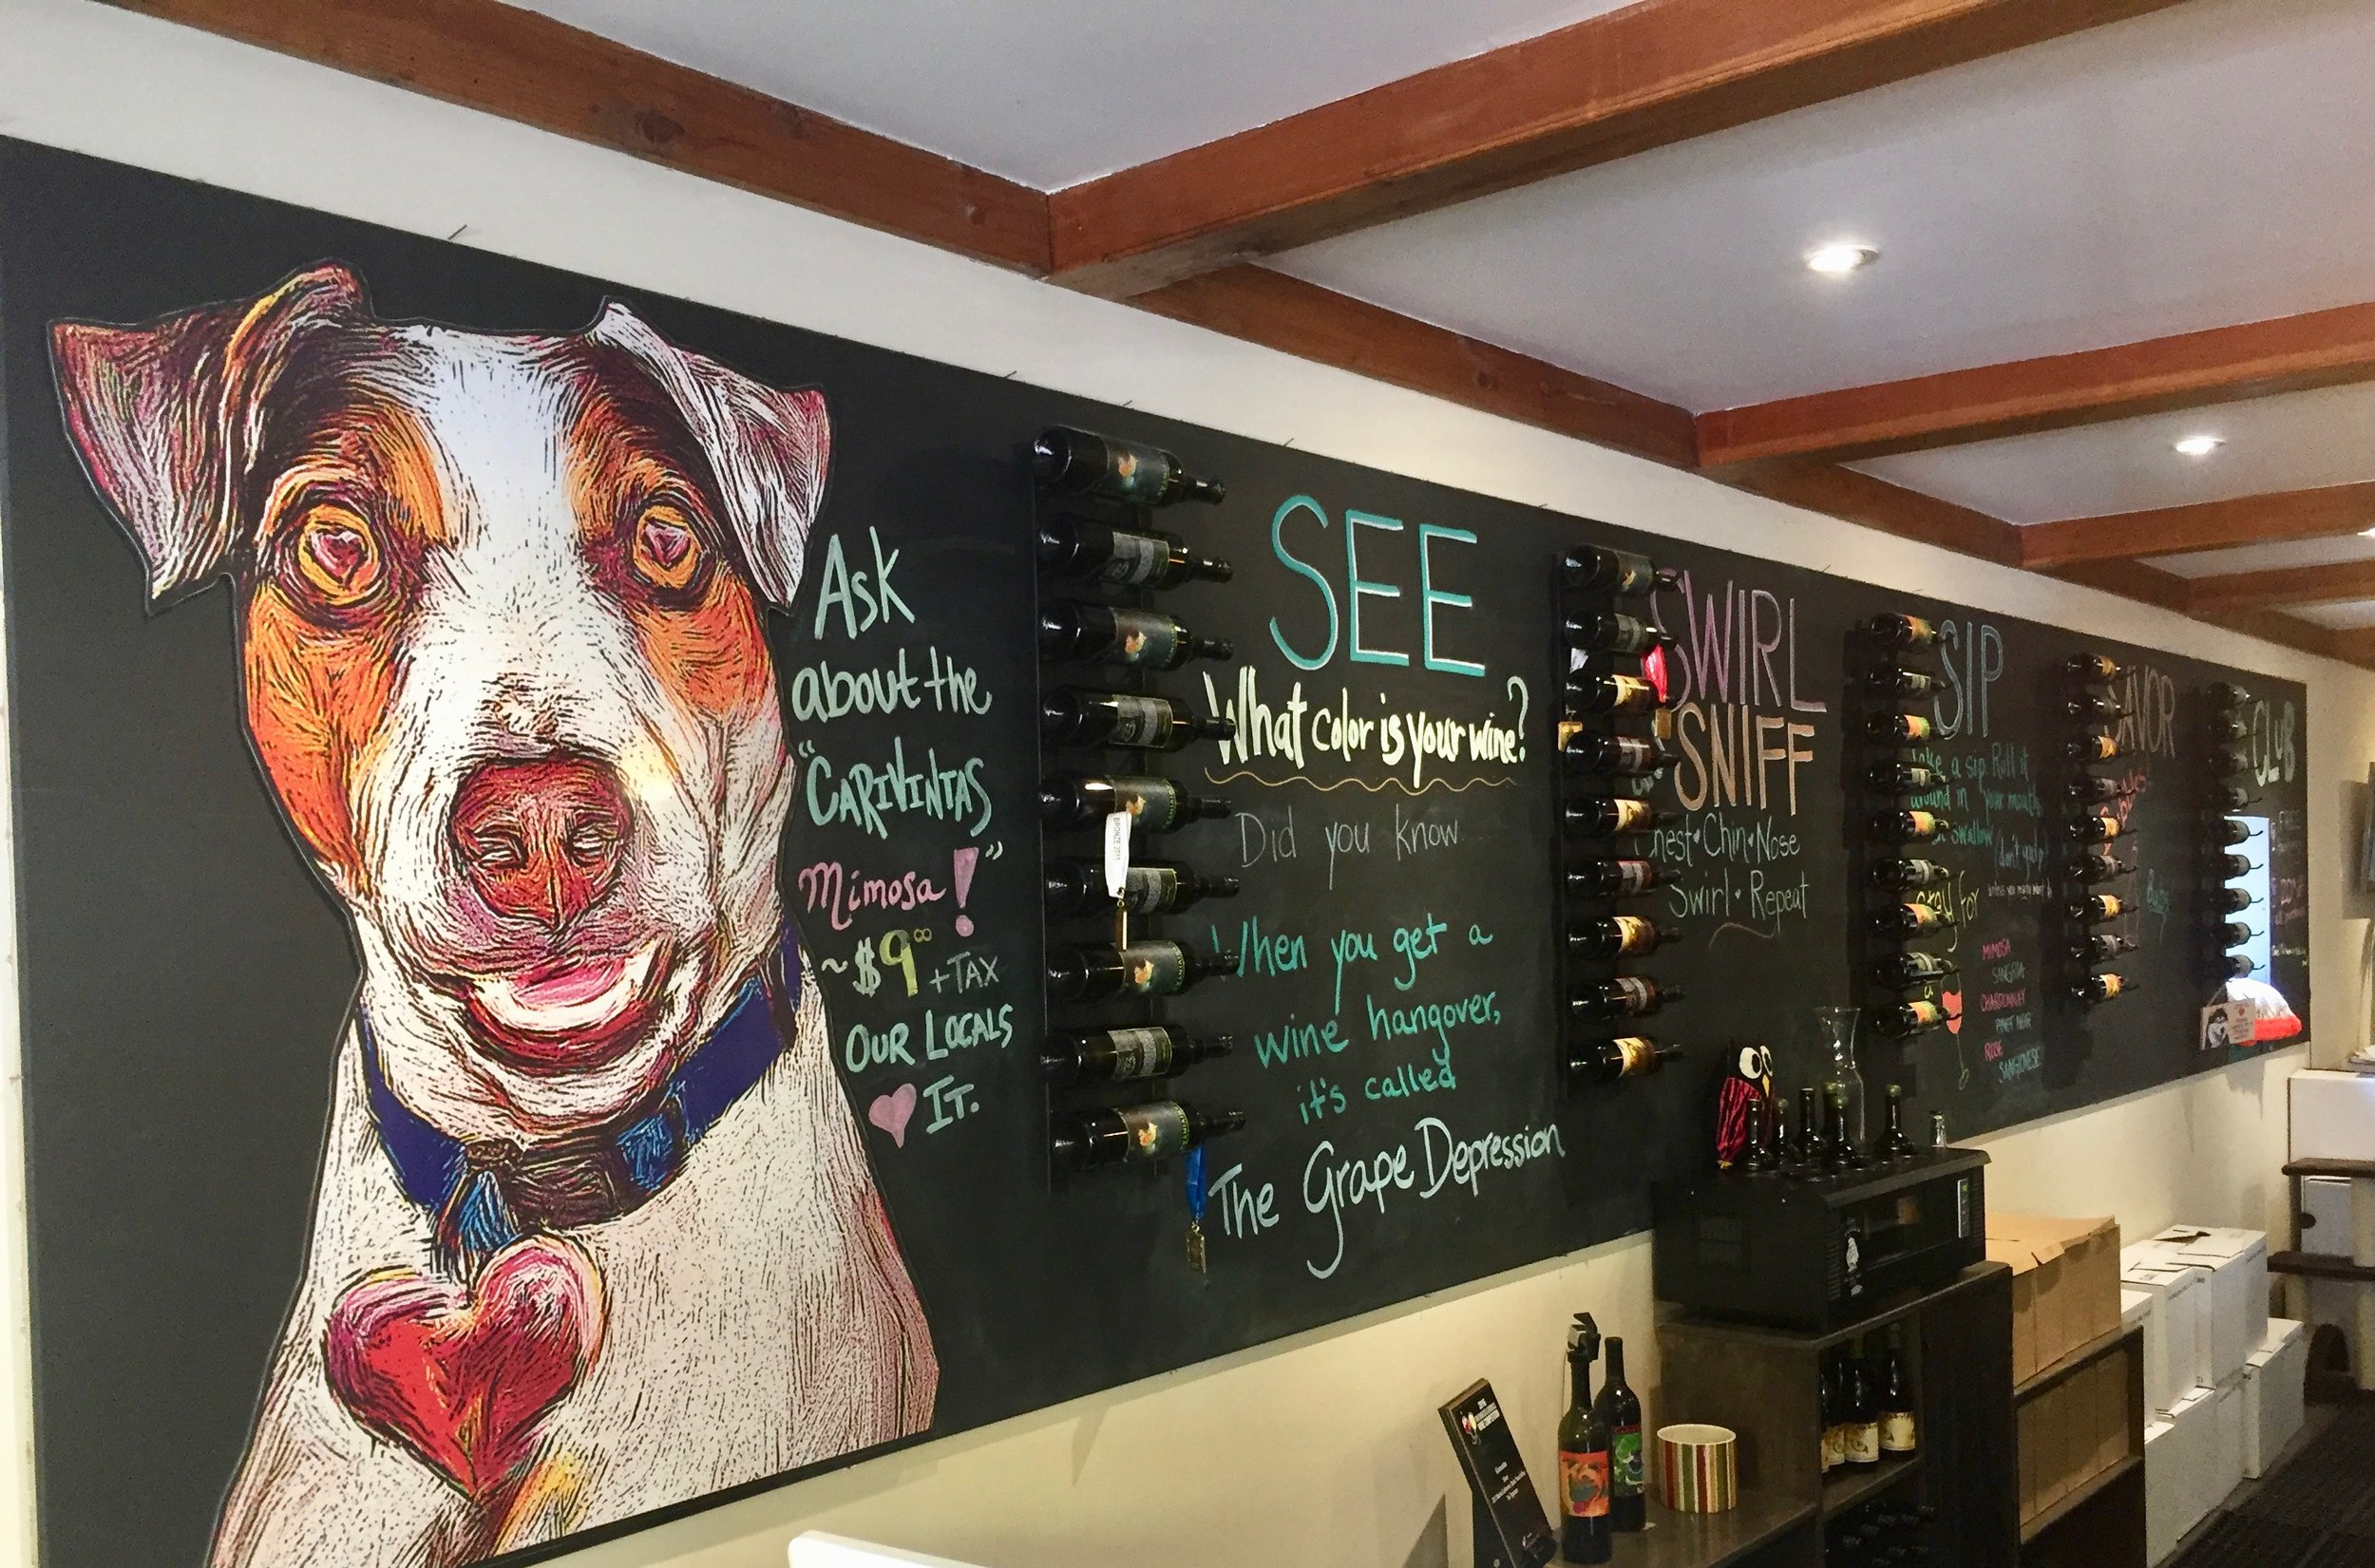 revisit wine co carivintas tasting room.jpg